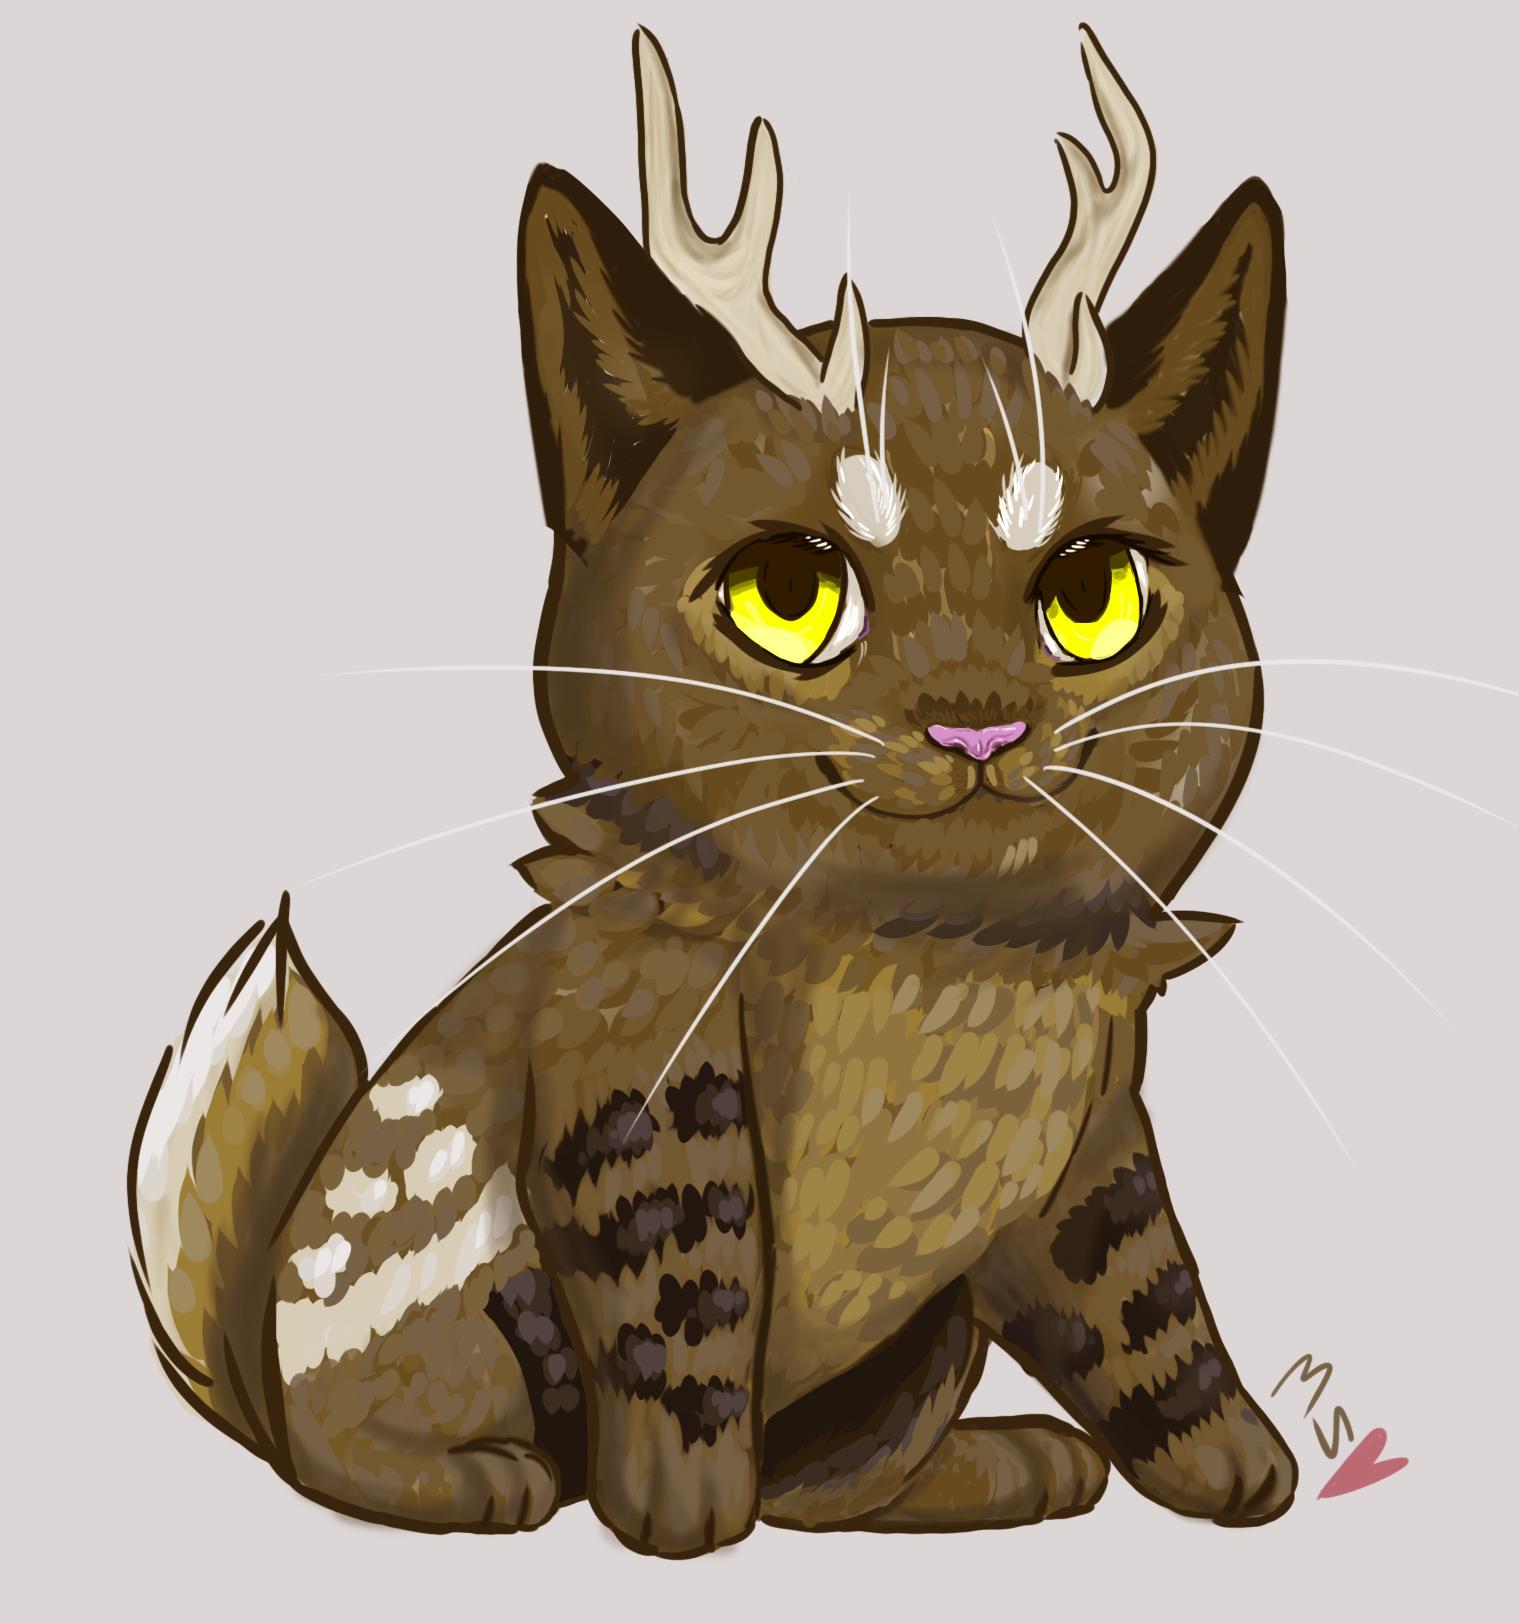 Deercat by Mespehria